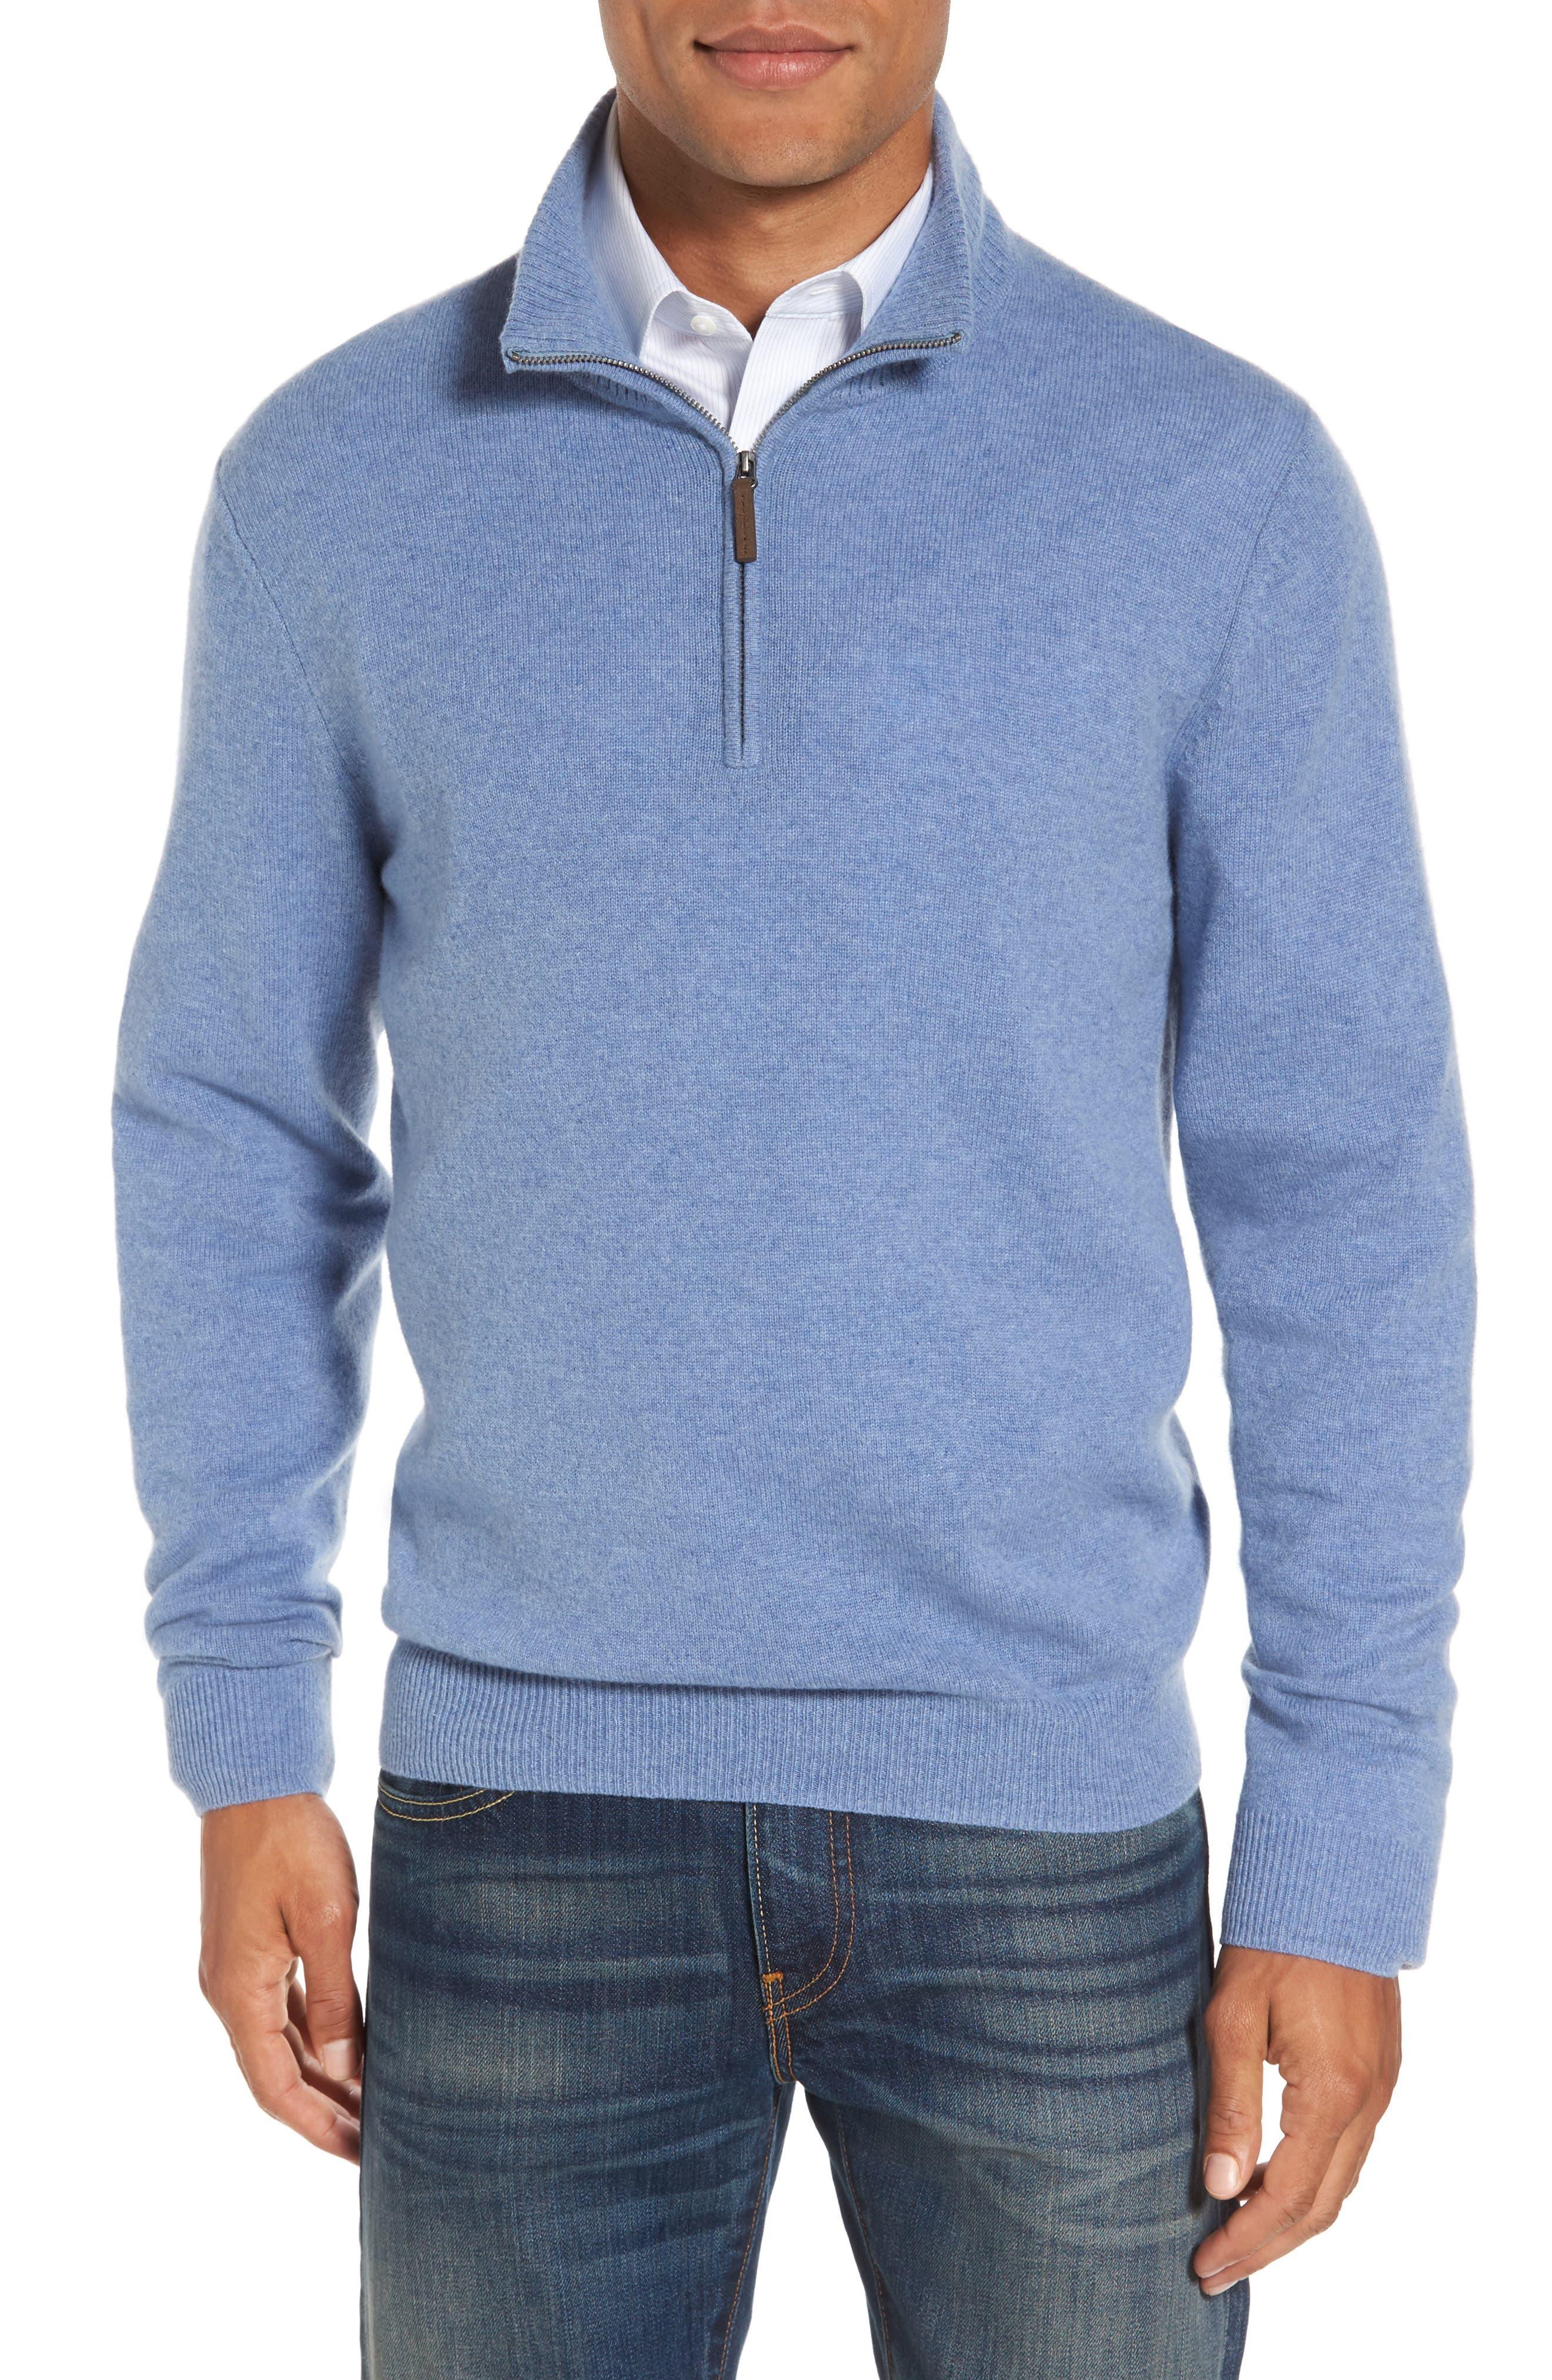 Nordstrom Men's Shop Cashmere Quarter Zip Sweater (Big)